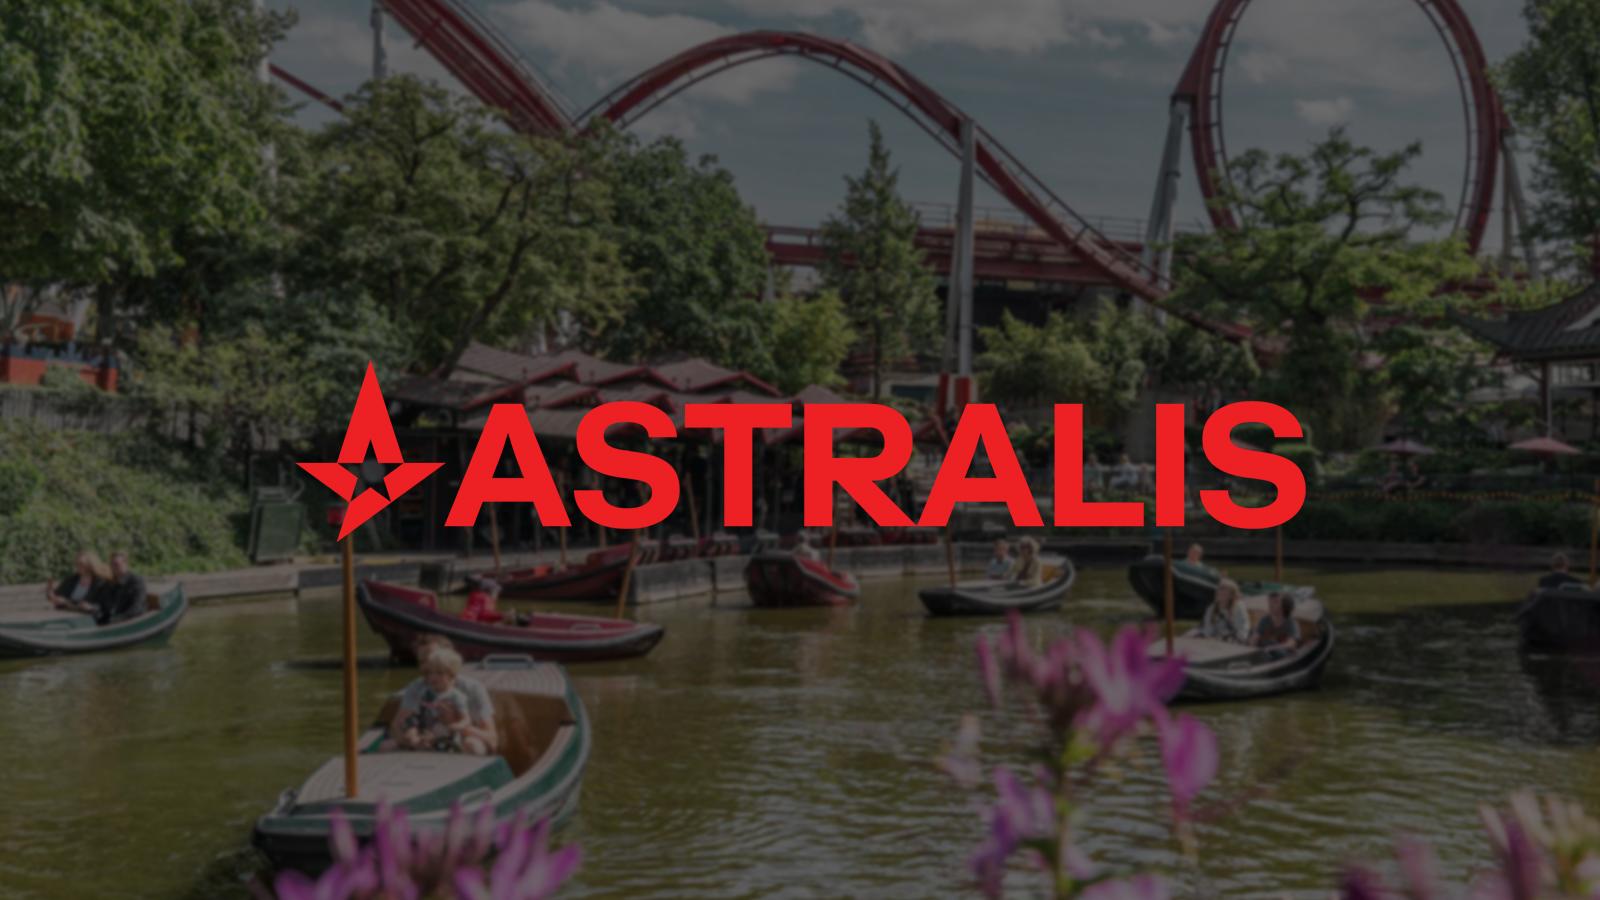 Astralis Tivoli Amusement Park